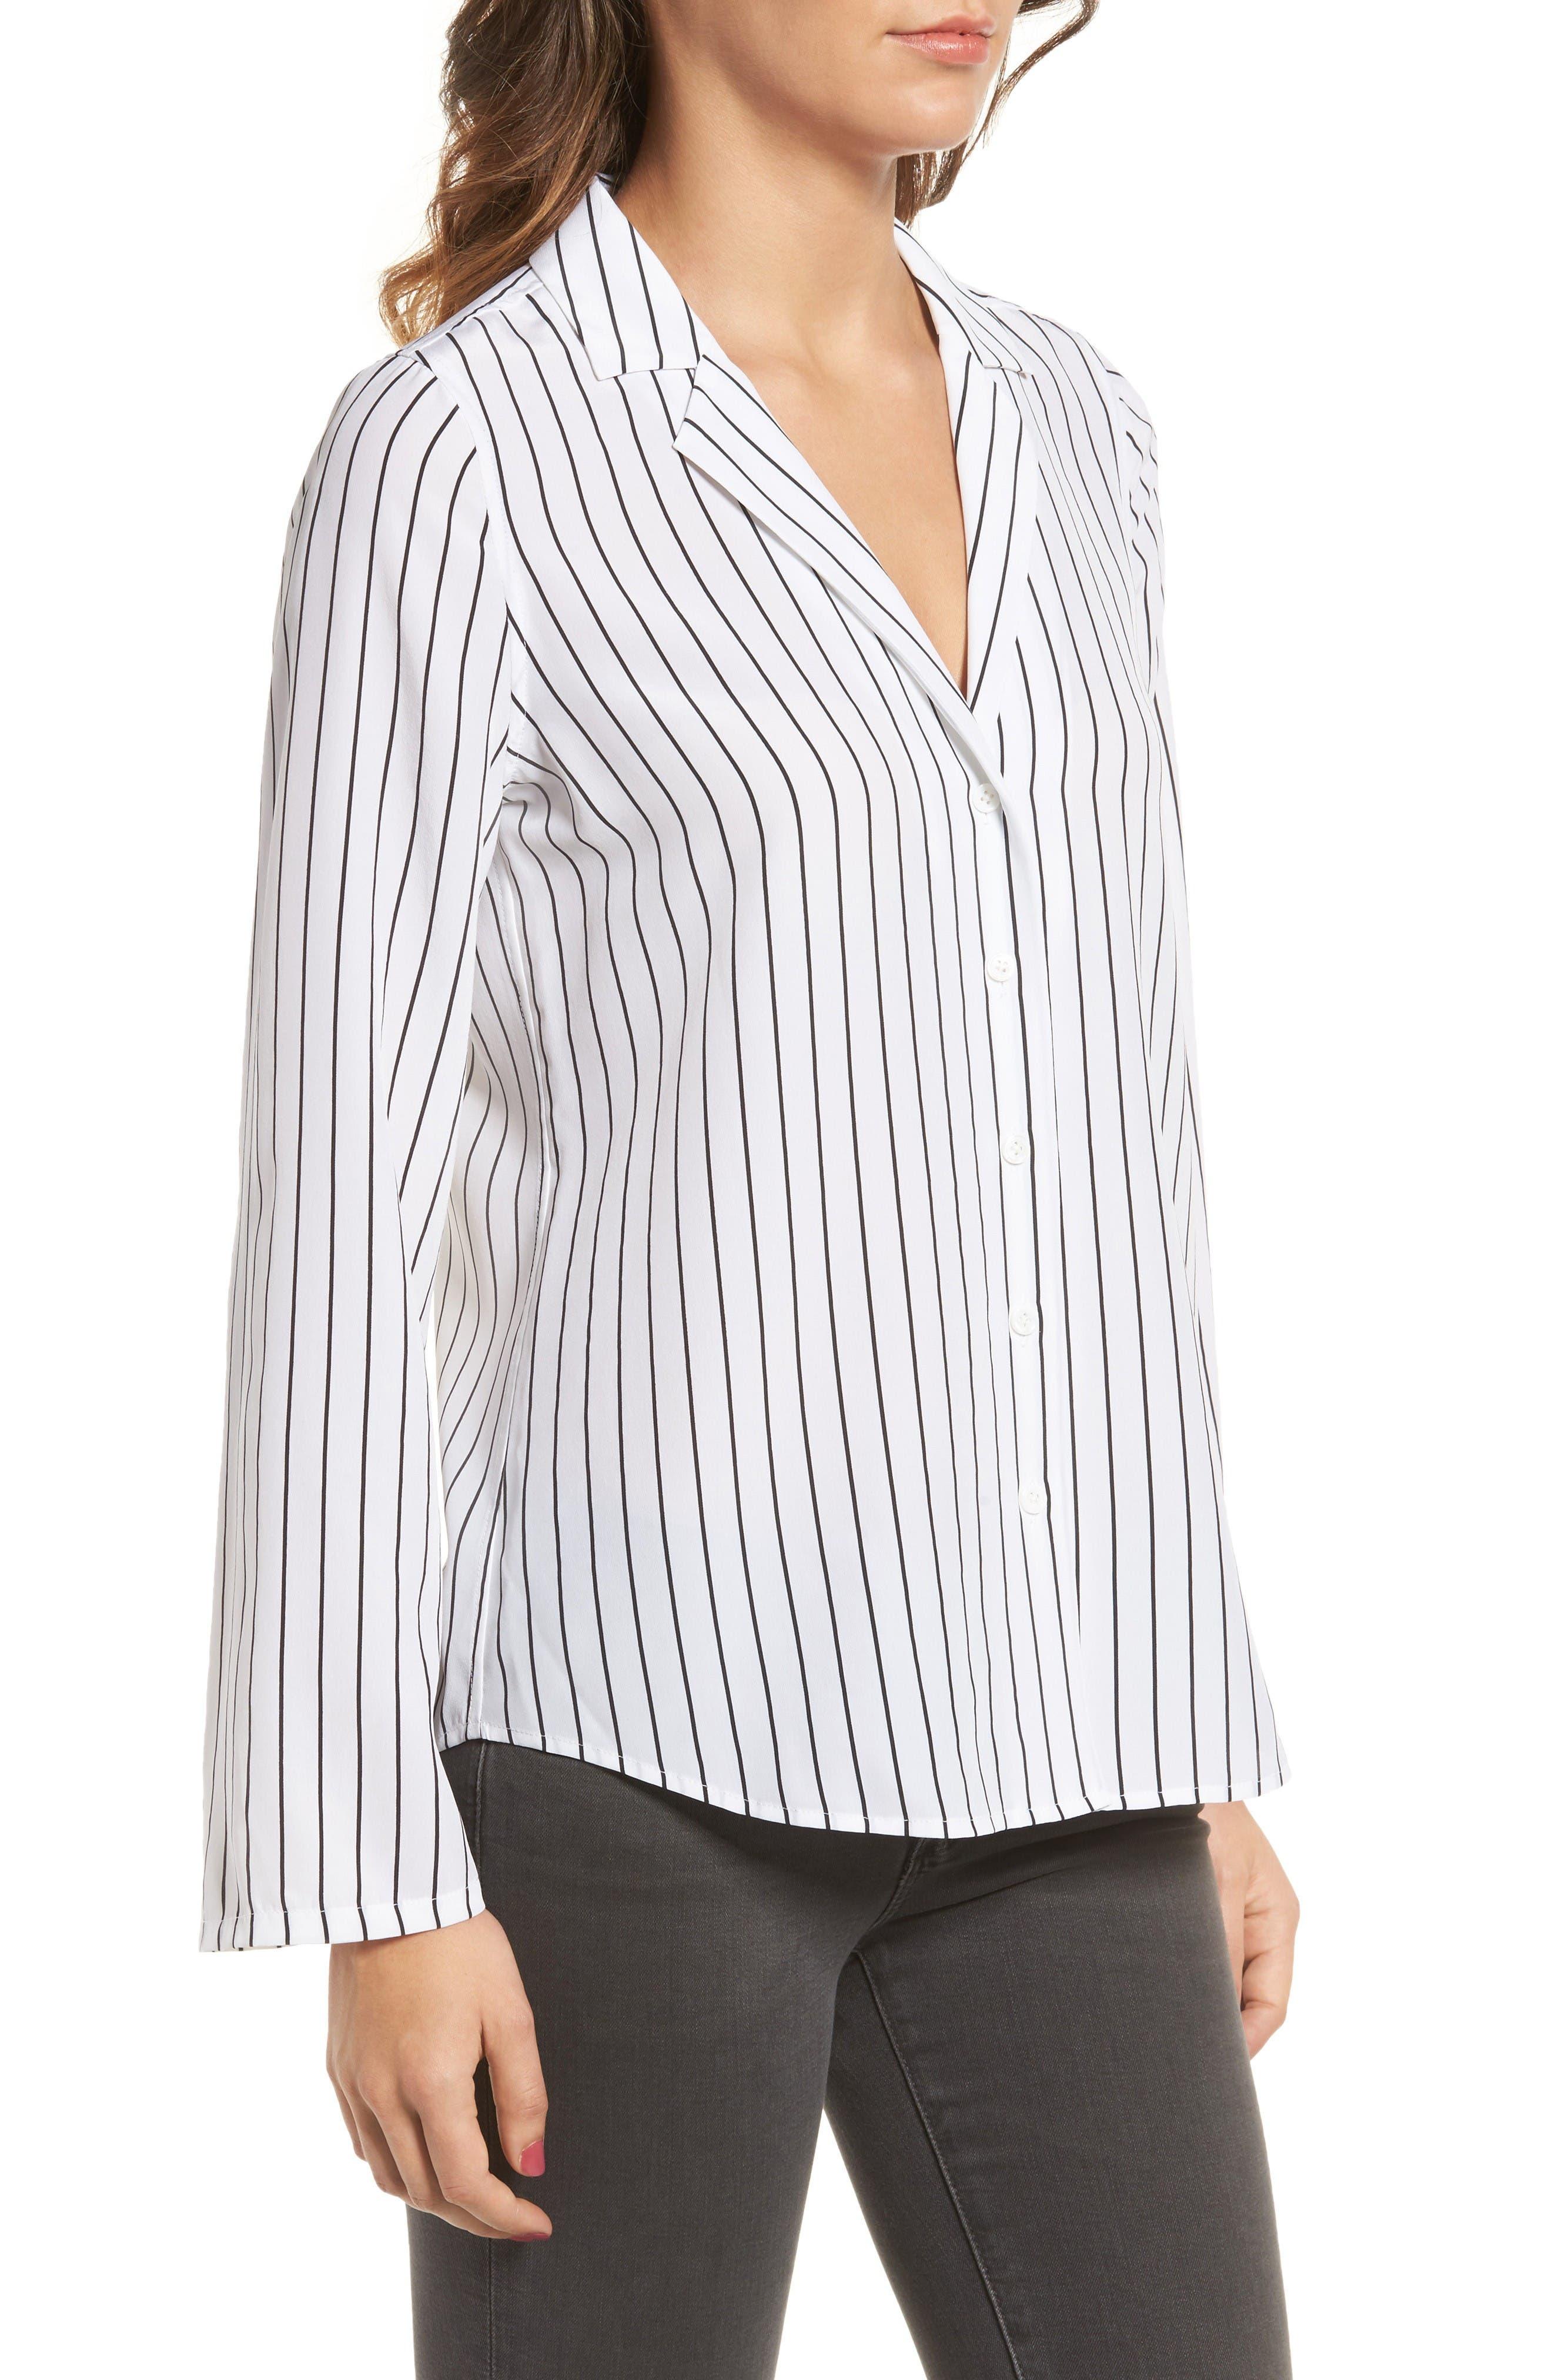 Avery Silk Shirt,                             Alternate thumbnail 3, color,                             True White / True Black Stripe